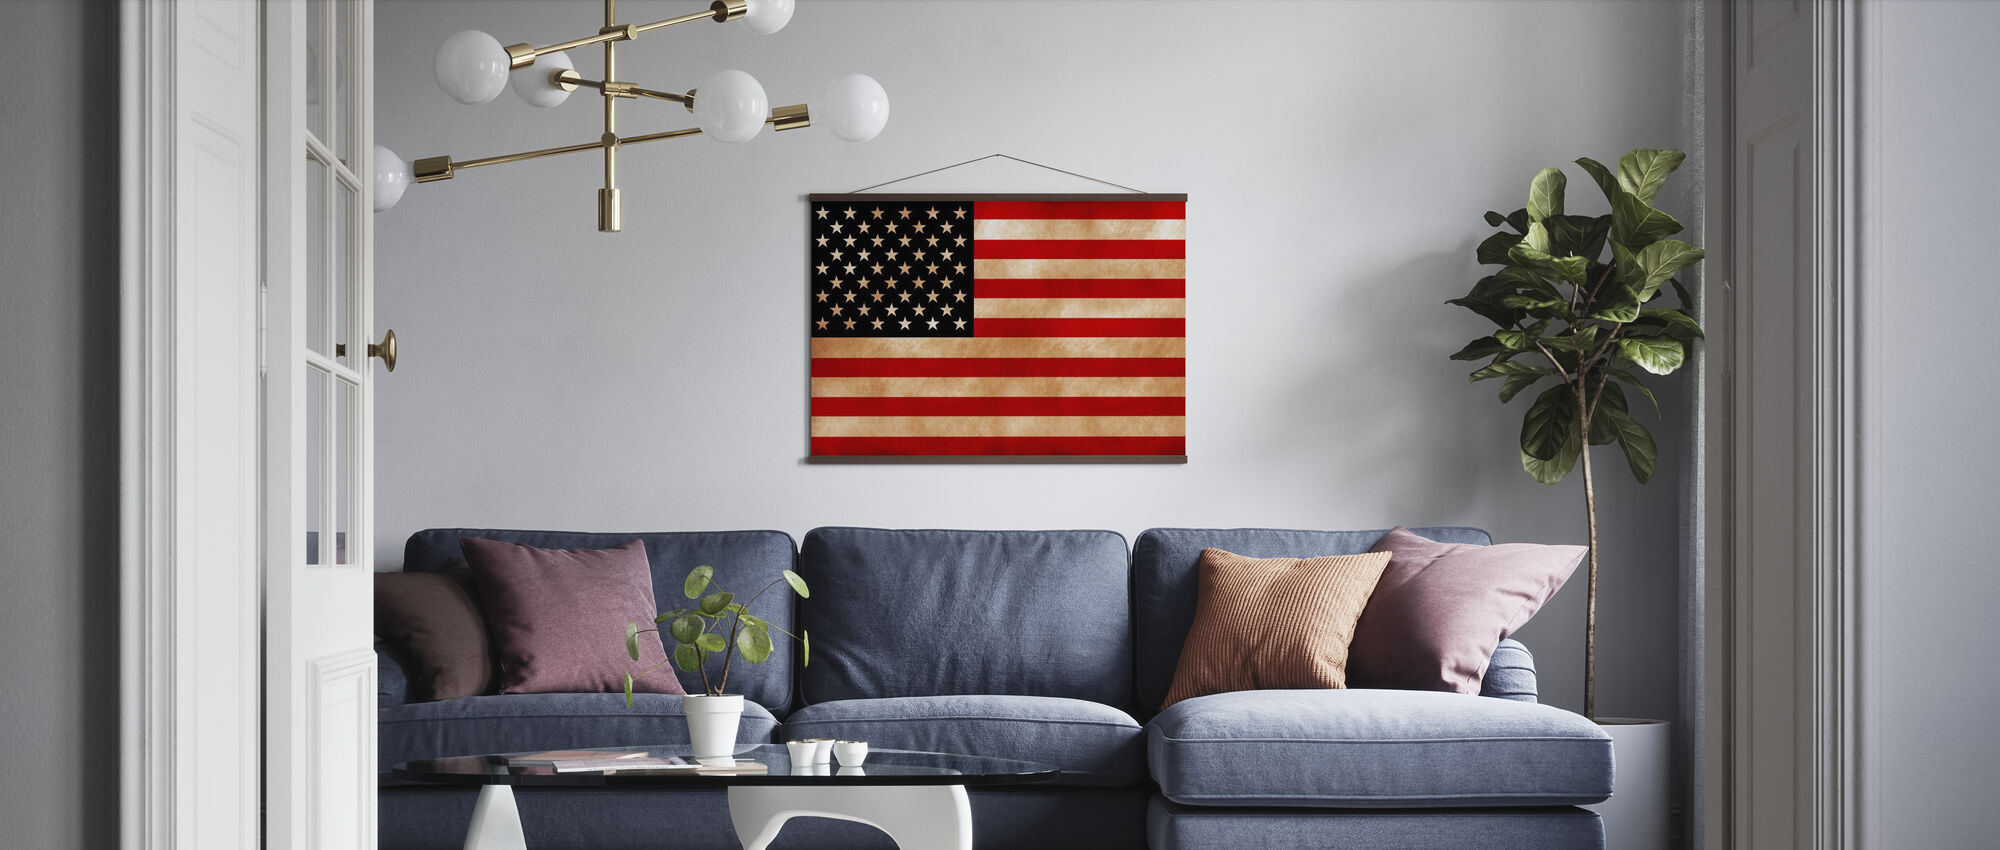 USA Flagge - Poster - Wohnzimmer